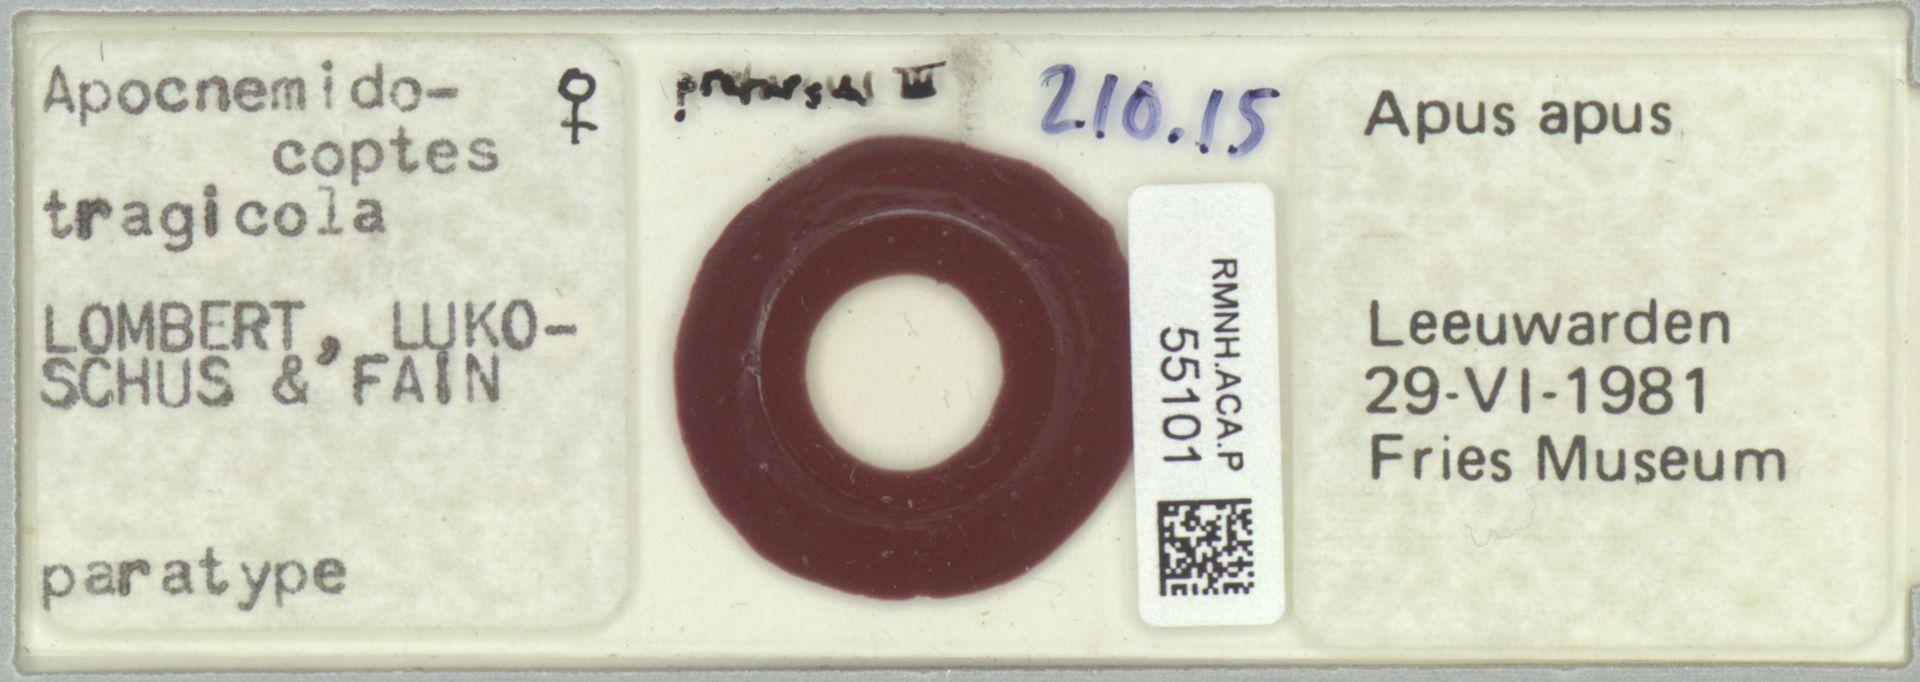 RMNH.ACA.P.55101 | Apocnemidocoptes tragicola Lombert, Lukoschus & Fain